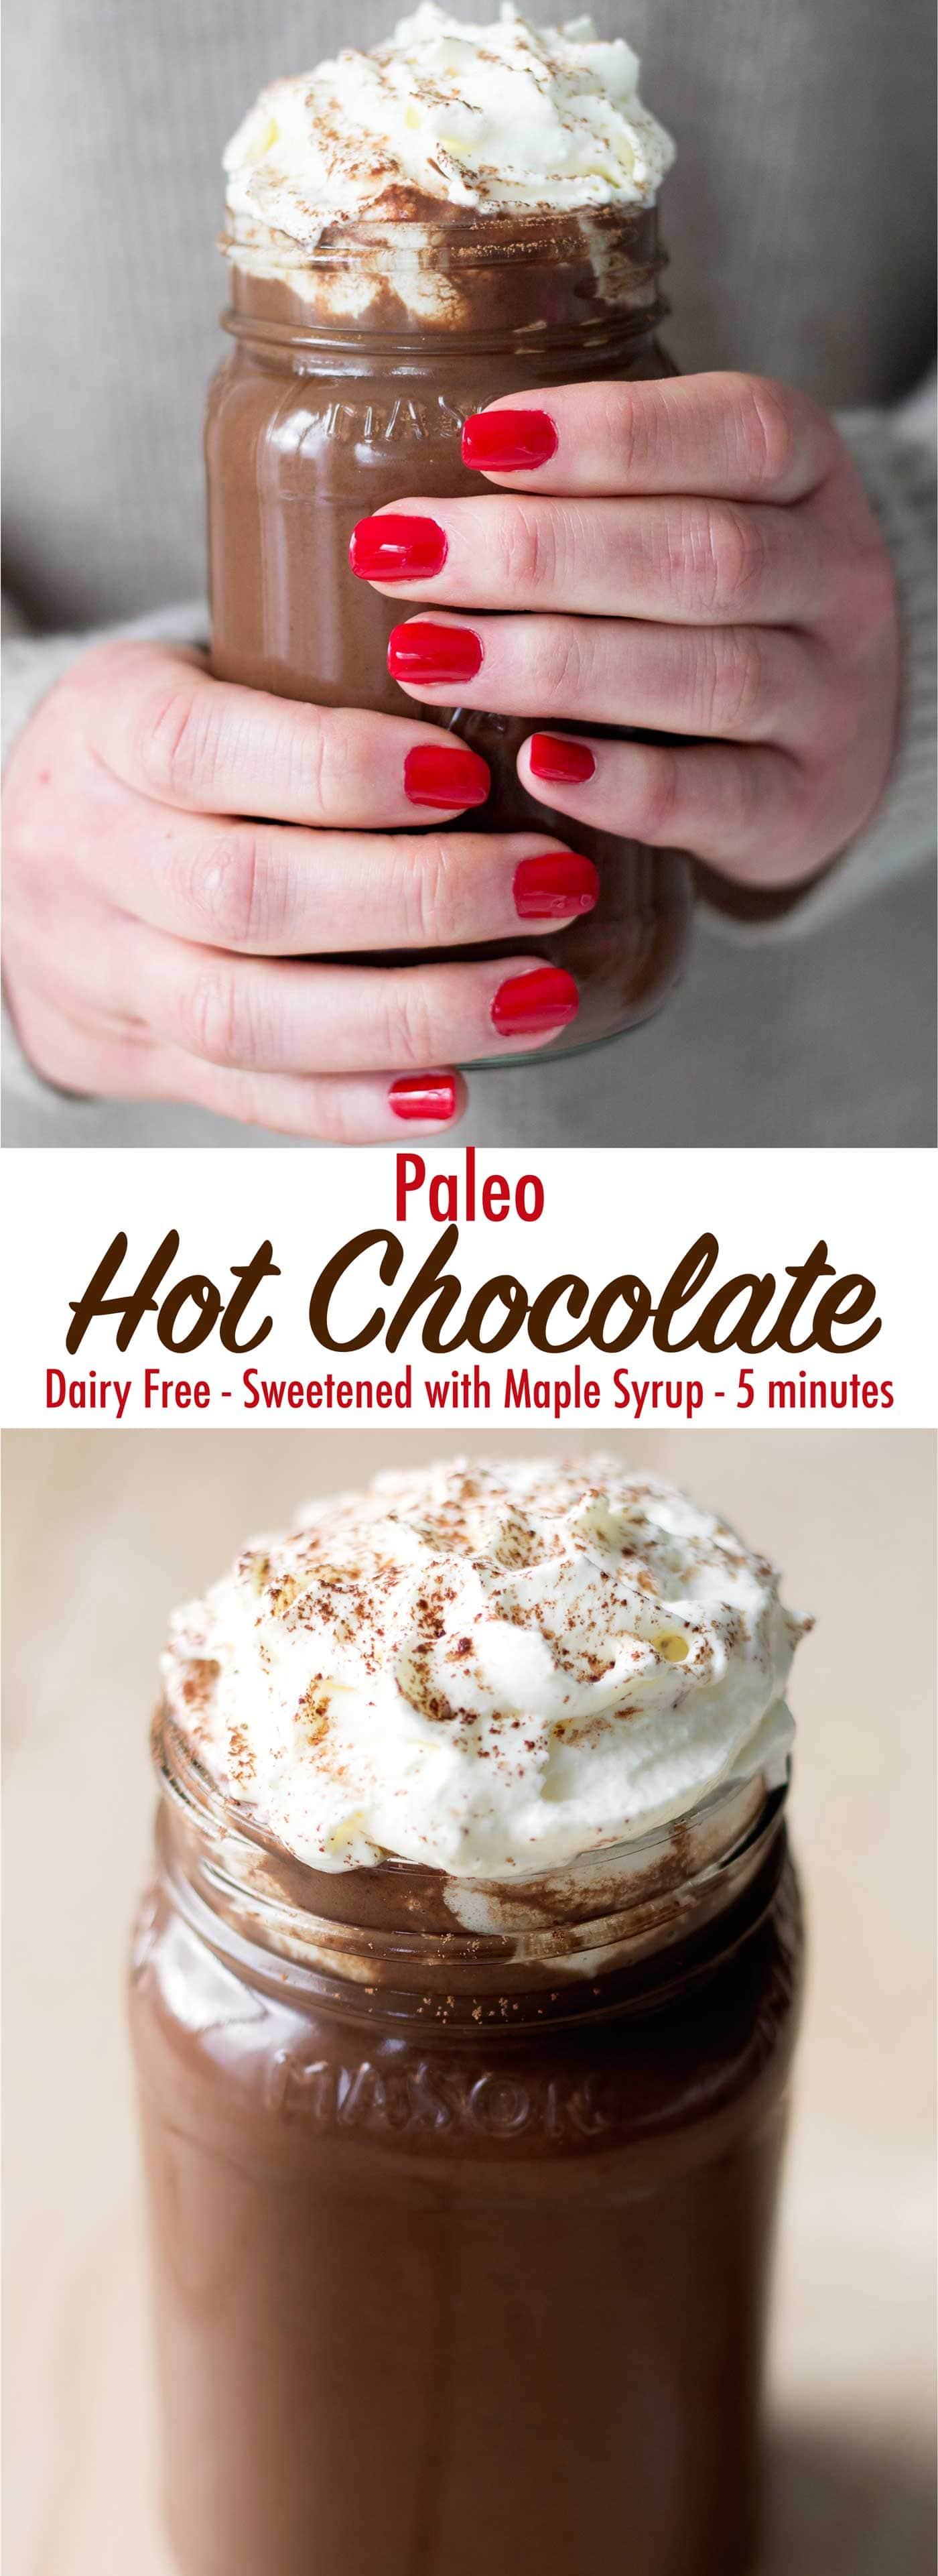 Paleo Hot Chocolate - Kit's Coastal